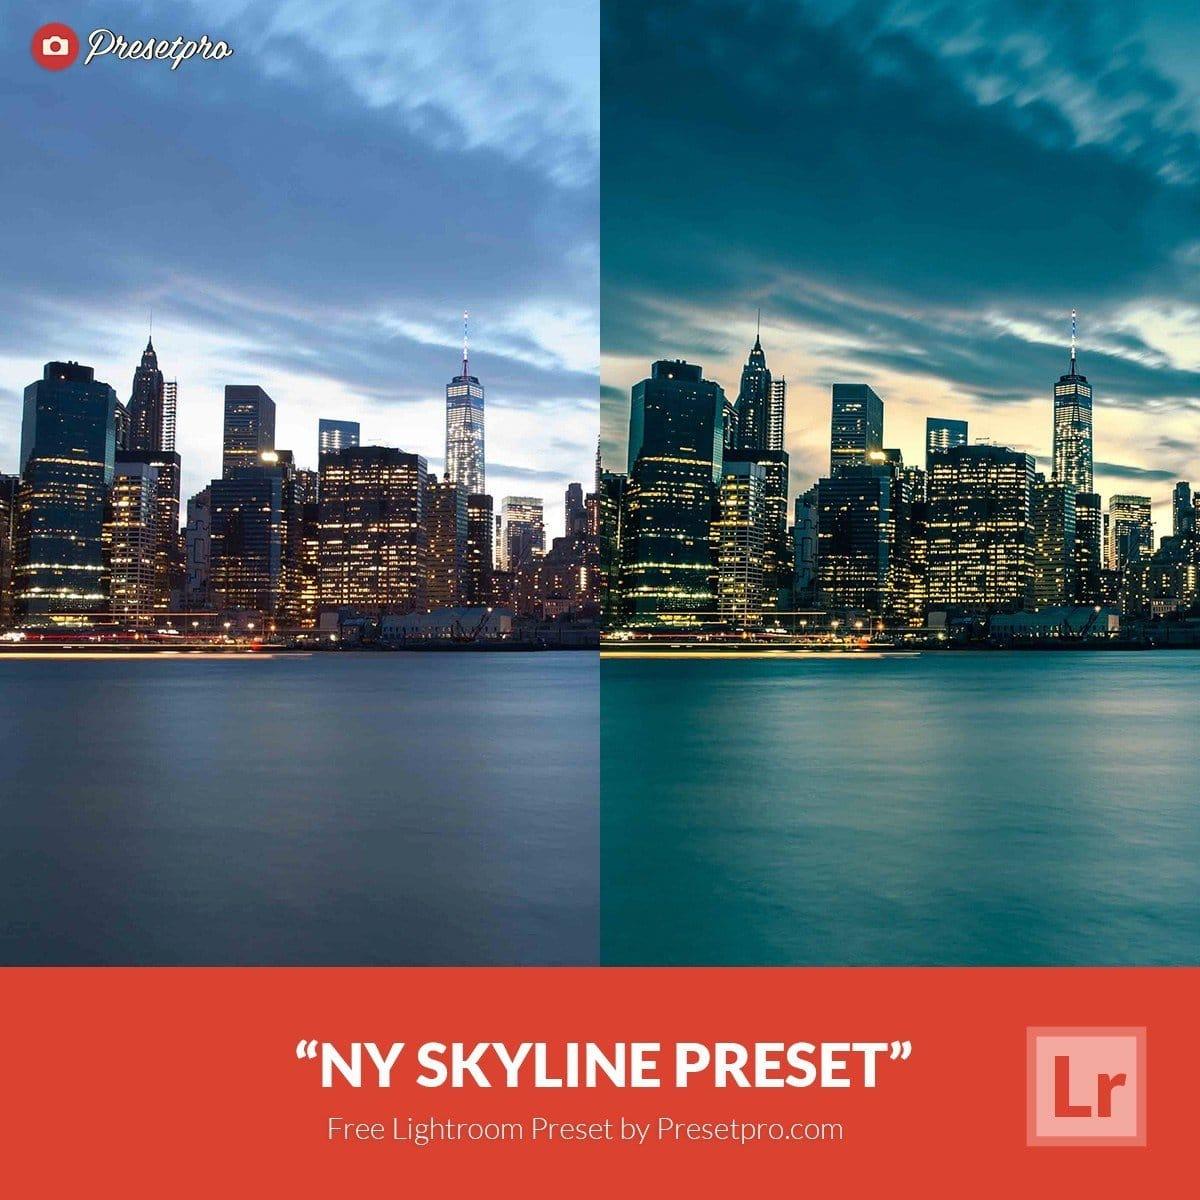 Free-Lightroom-Preset-NY-Skyline-Presetpro.com